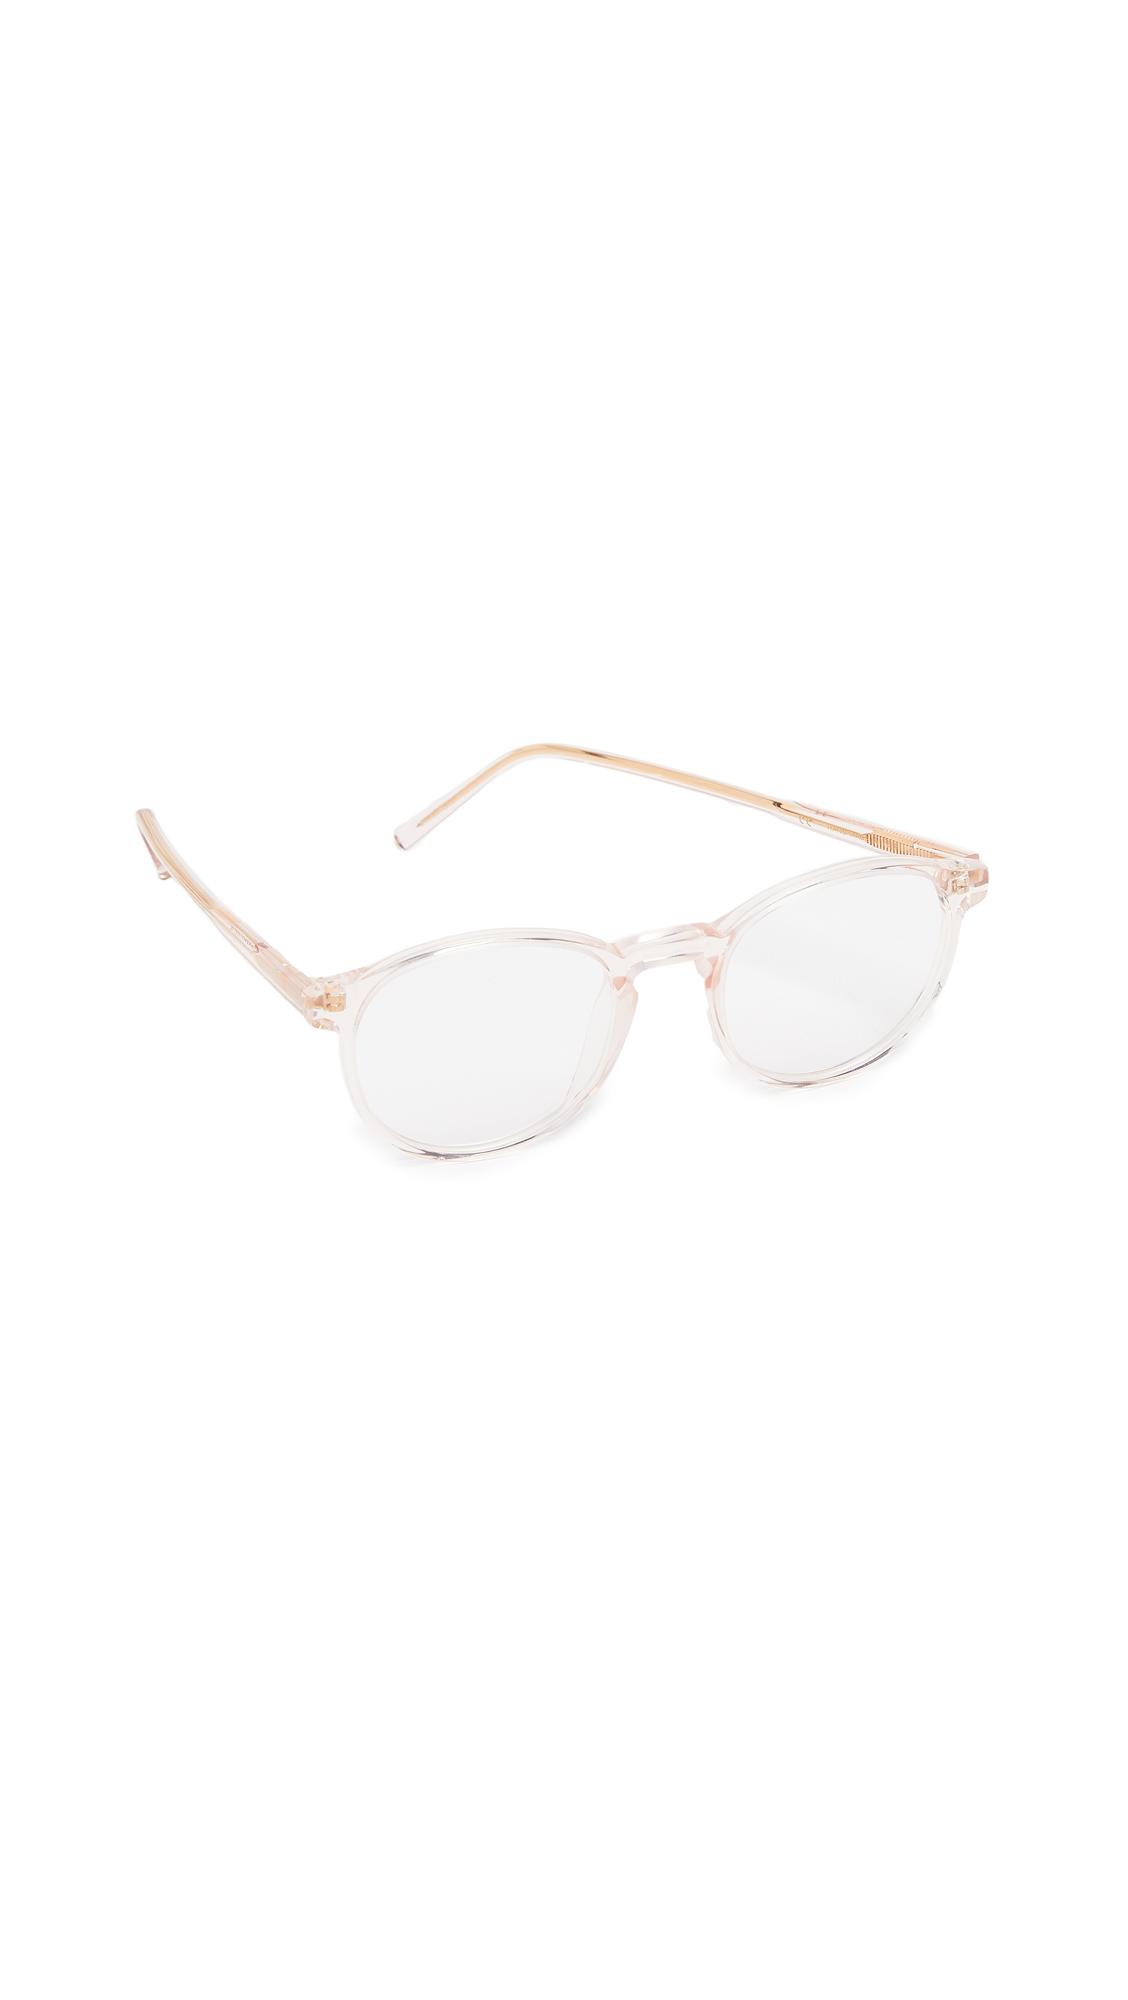 SUPER SUNGLASSES Numero 1 Glasses in Crystal Rose